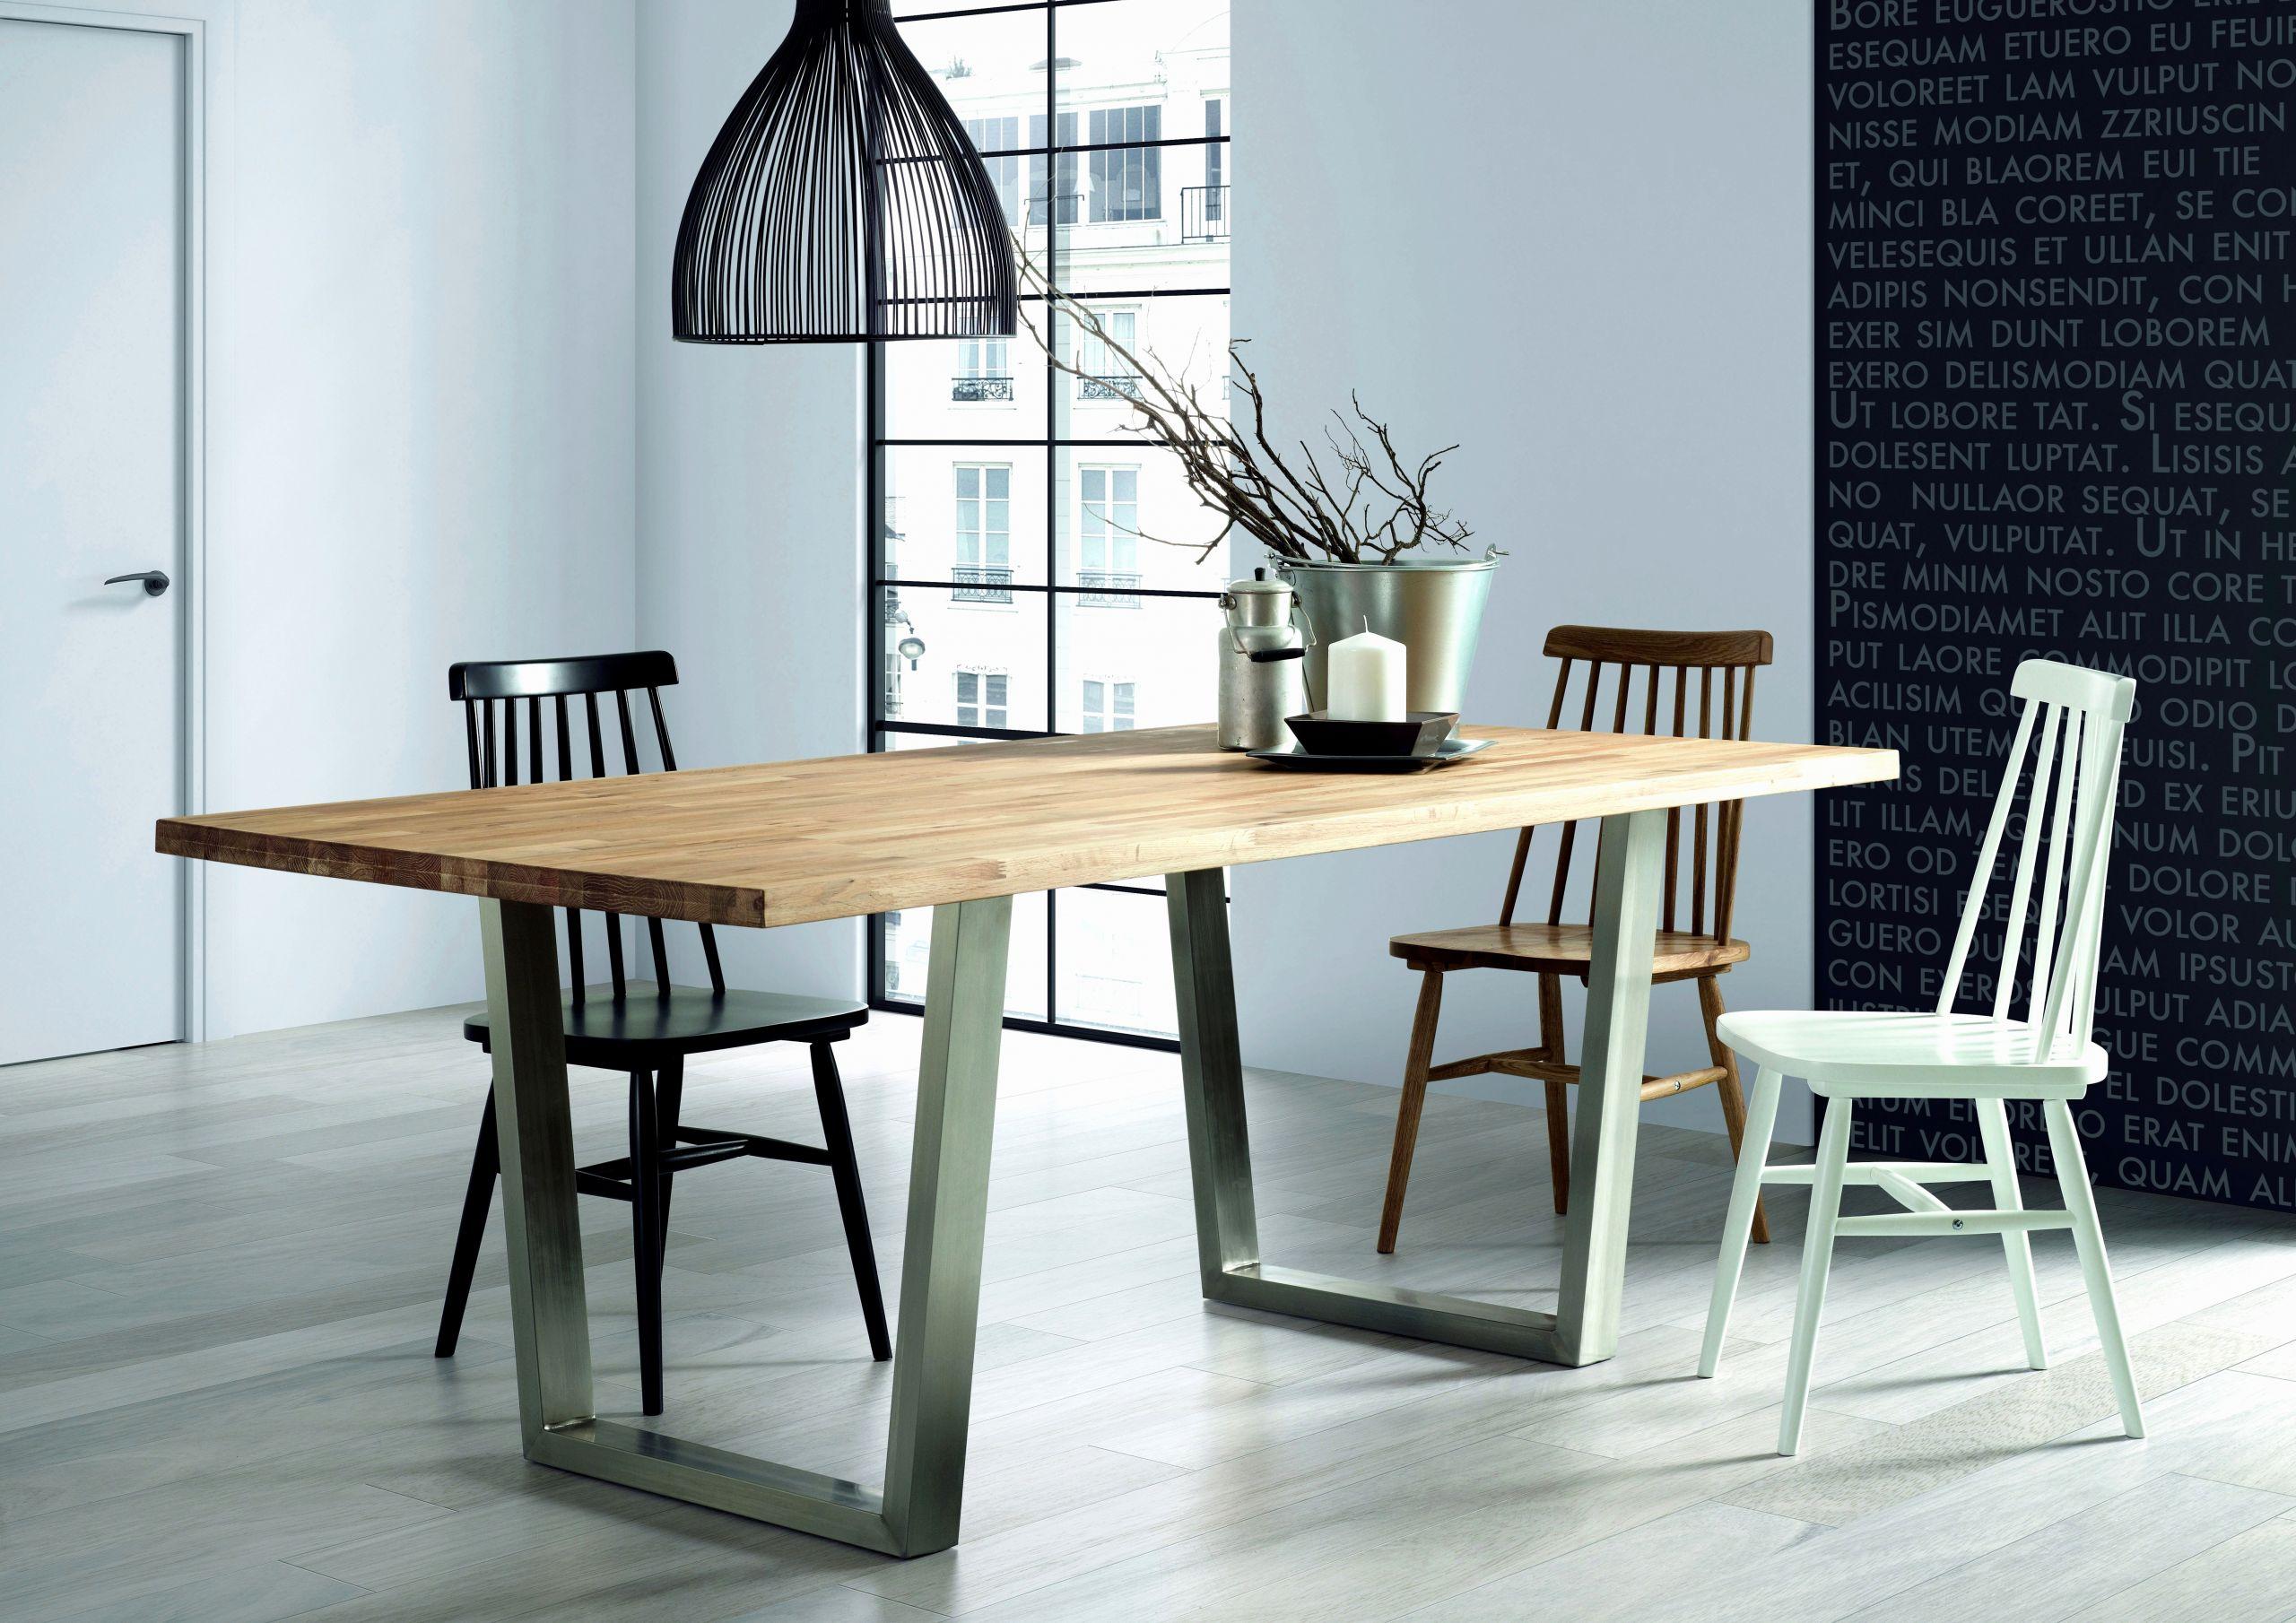 meubles bois et metal search results meuble cuisine bois metal mobilier bois metal mobilier bois metal